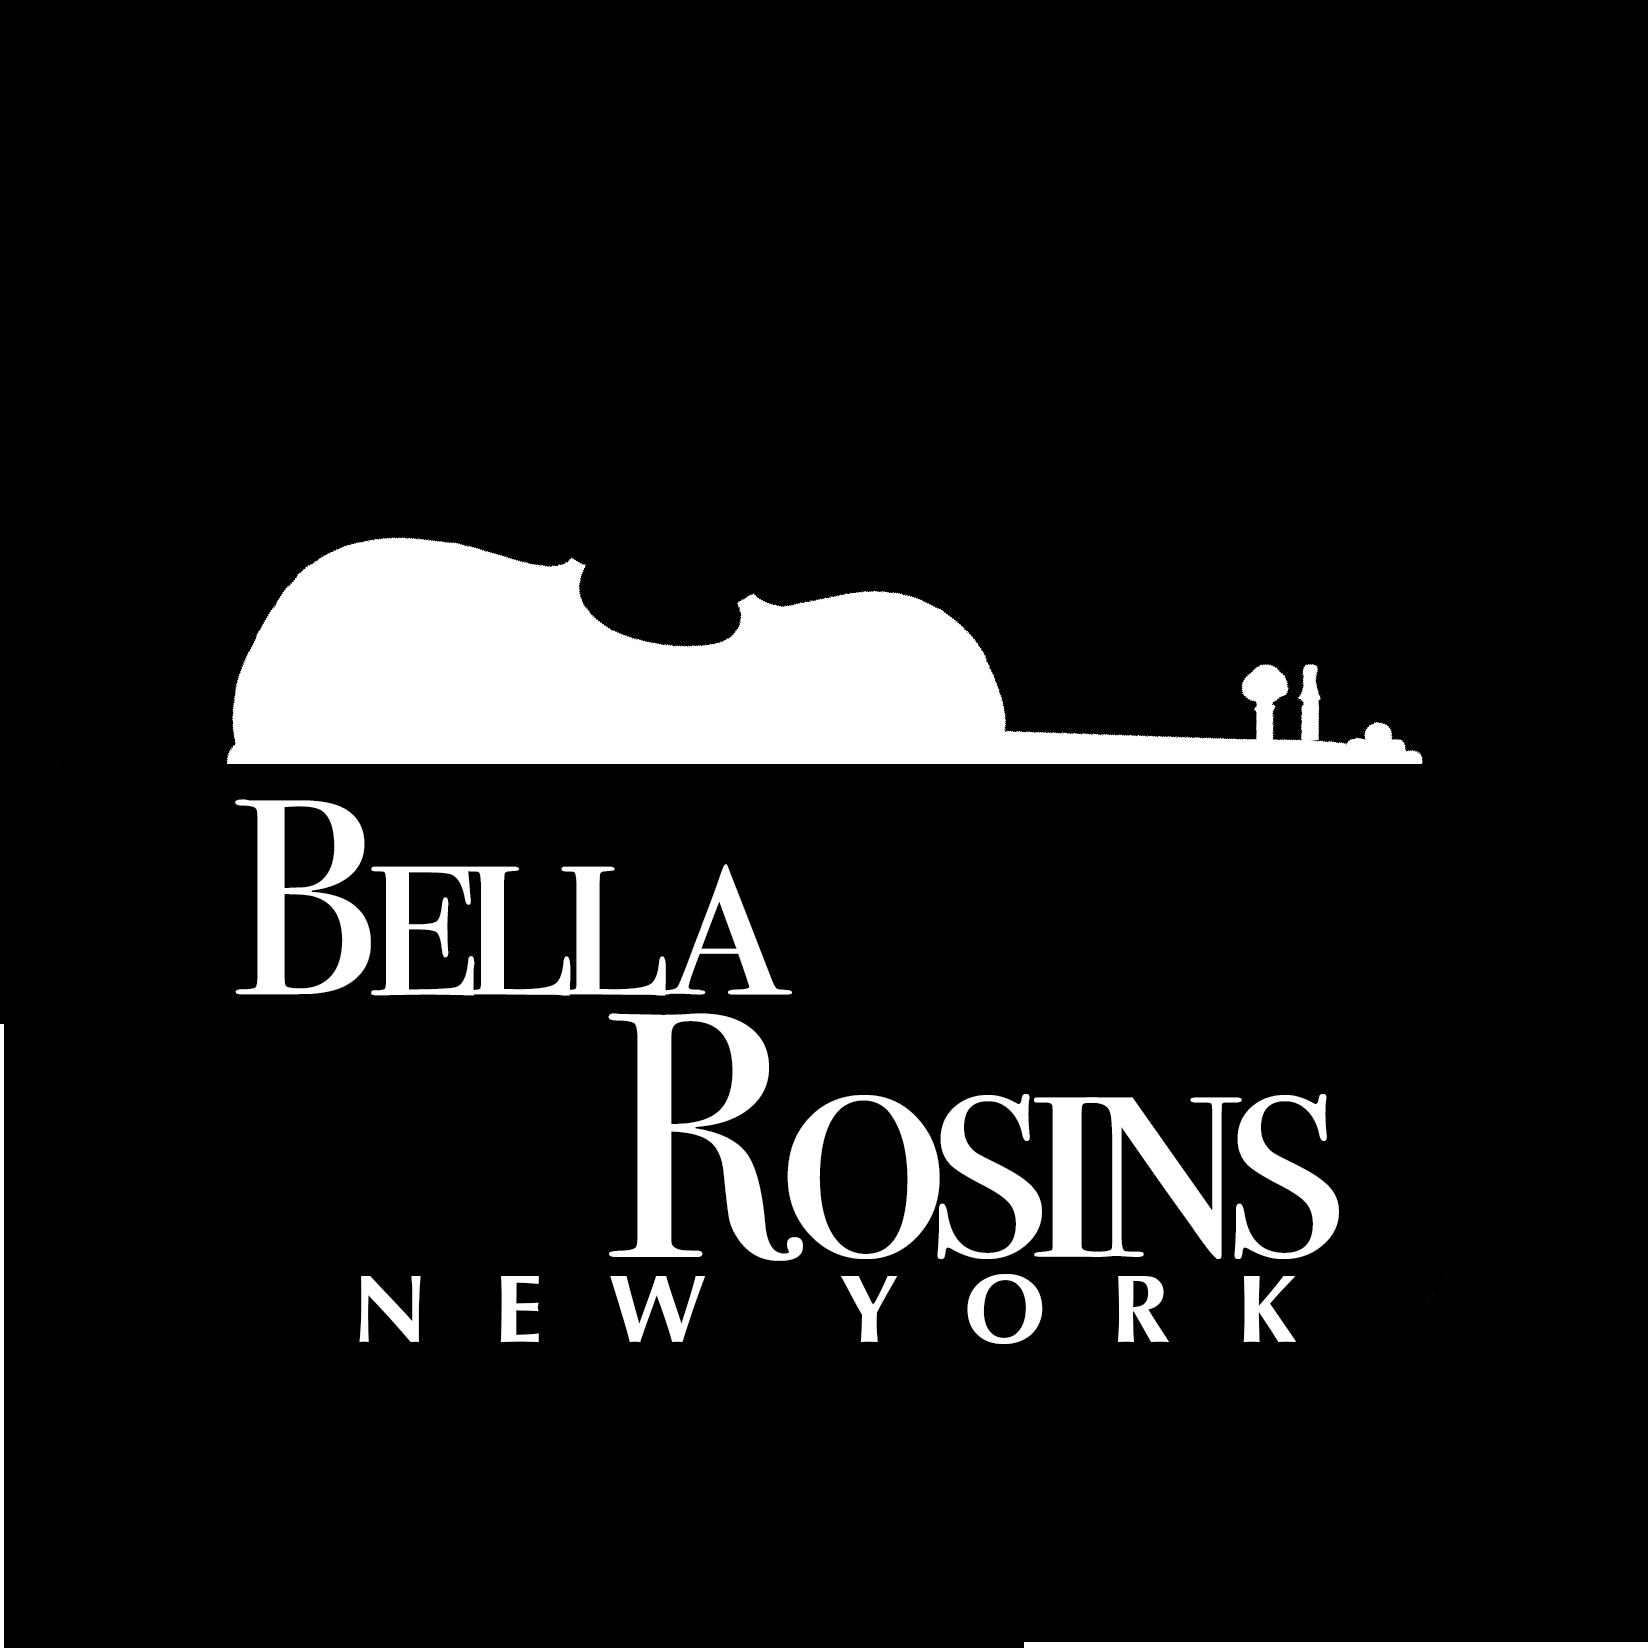 Bellarosinsny01 (1).png